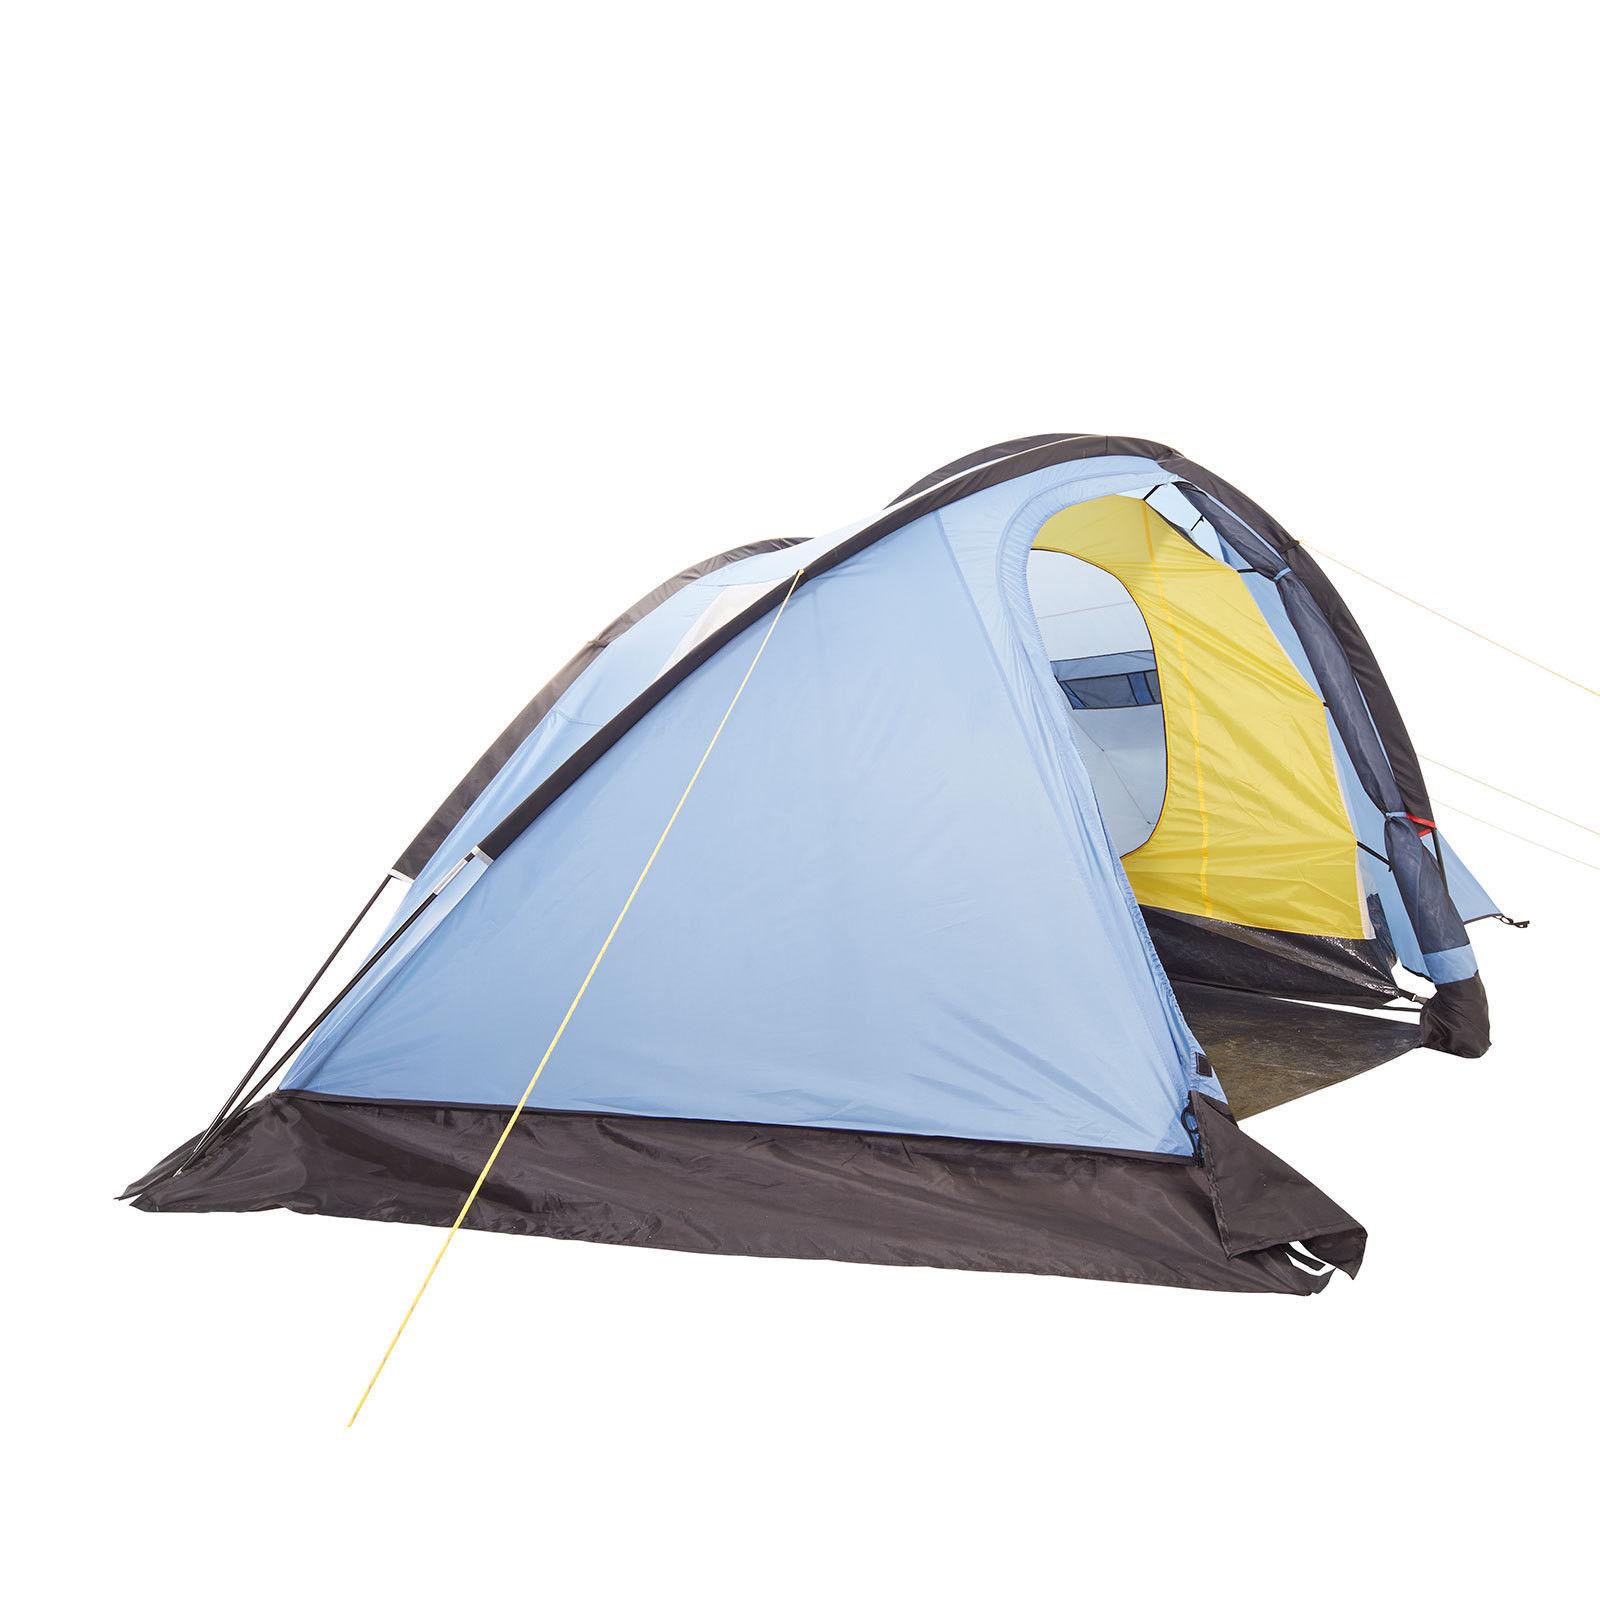 Zelt 3 Personen Mit Vorzelt : Grand canyon zelt anapolis personen camping